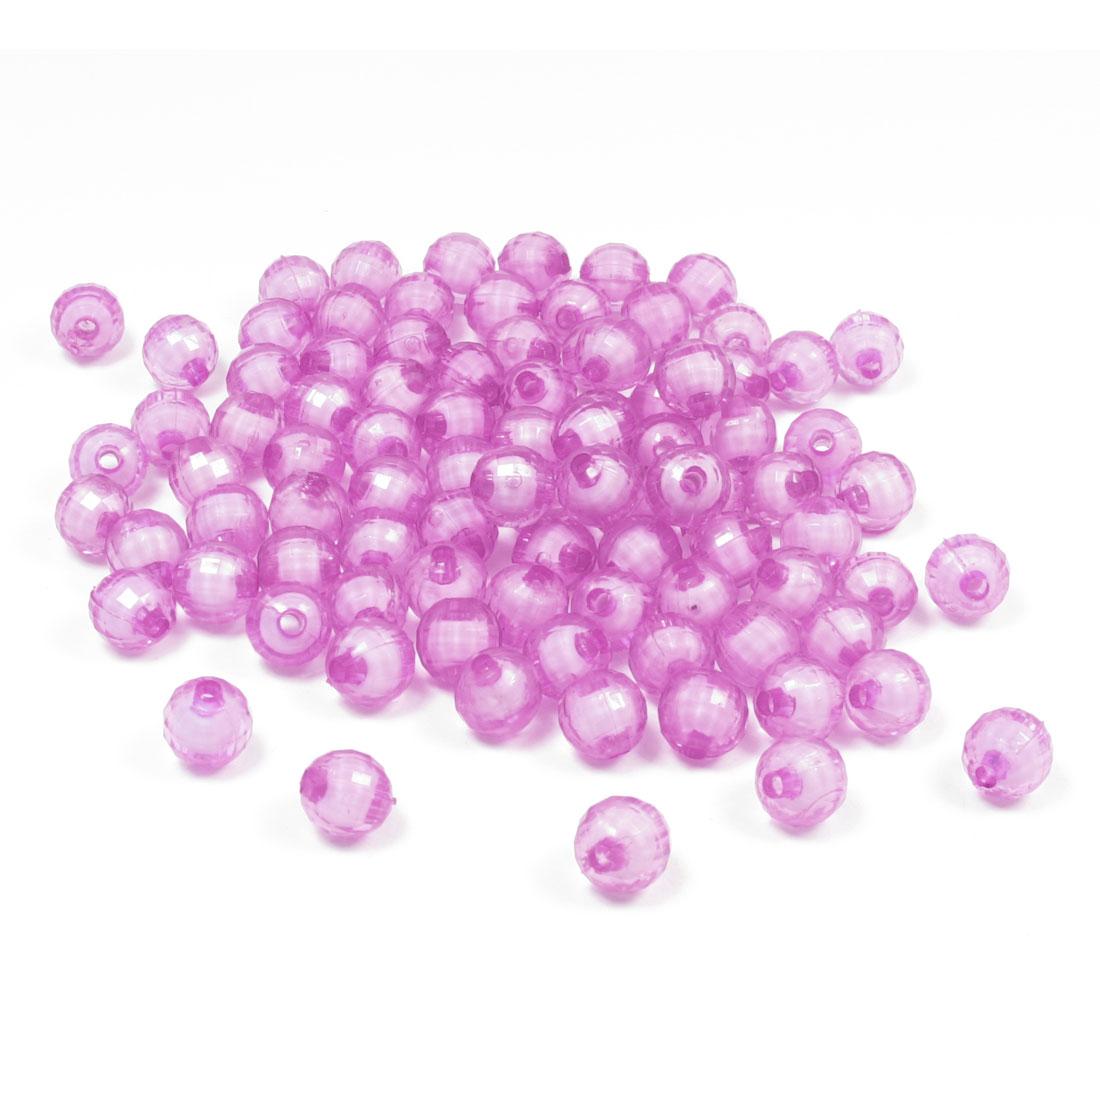 100 Pcs 8mm Fuchsia Plastic Jewelry Findings Crystal Ball Beads